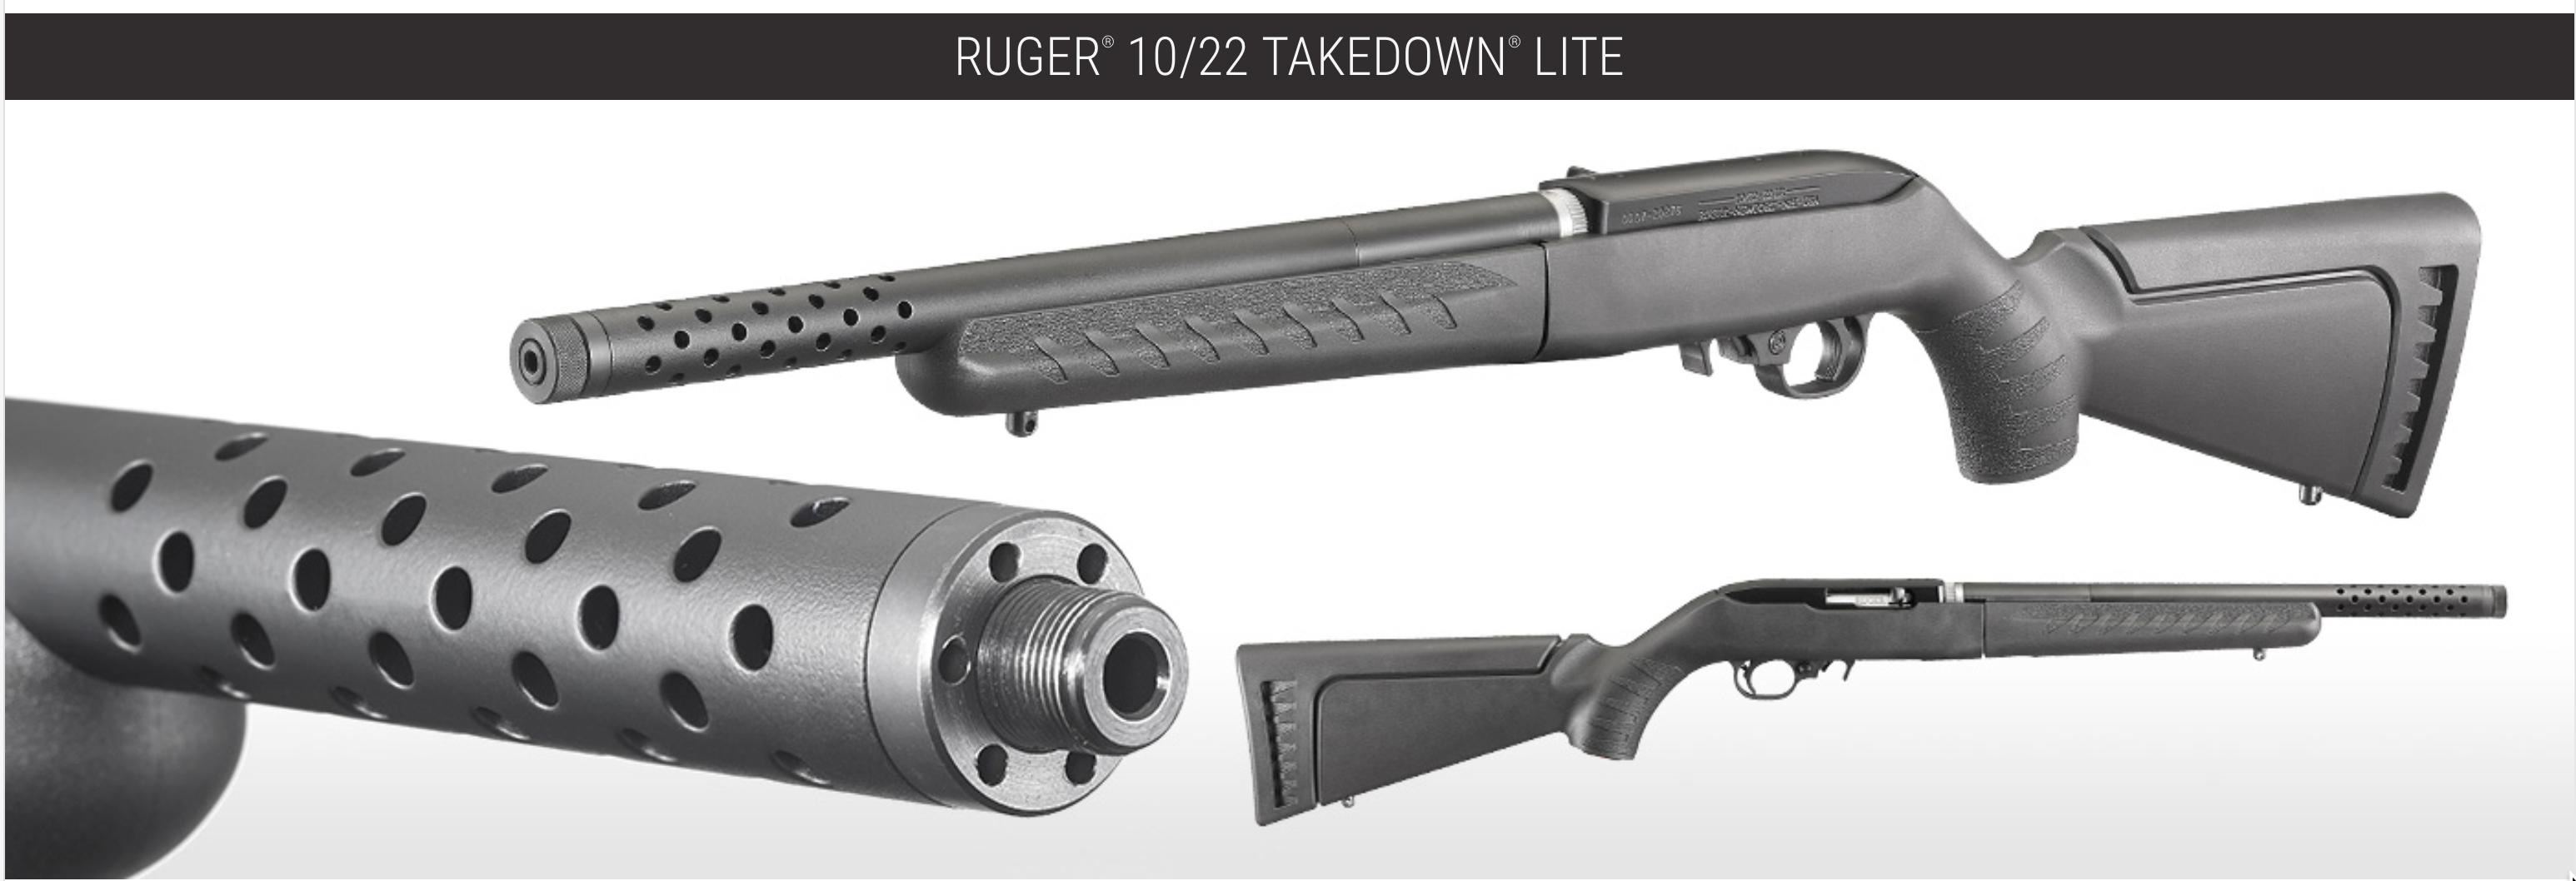 Ruger 10 22 Takedown Lite 22 Lr Semi Automatic Rimfire